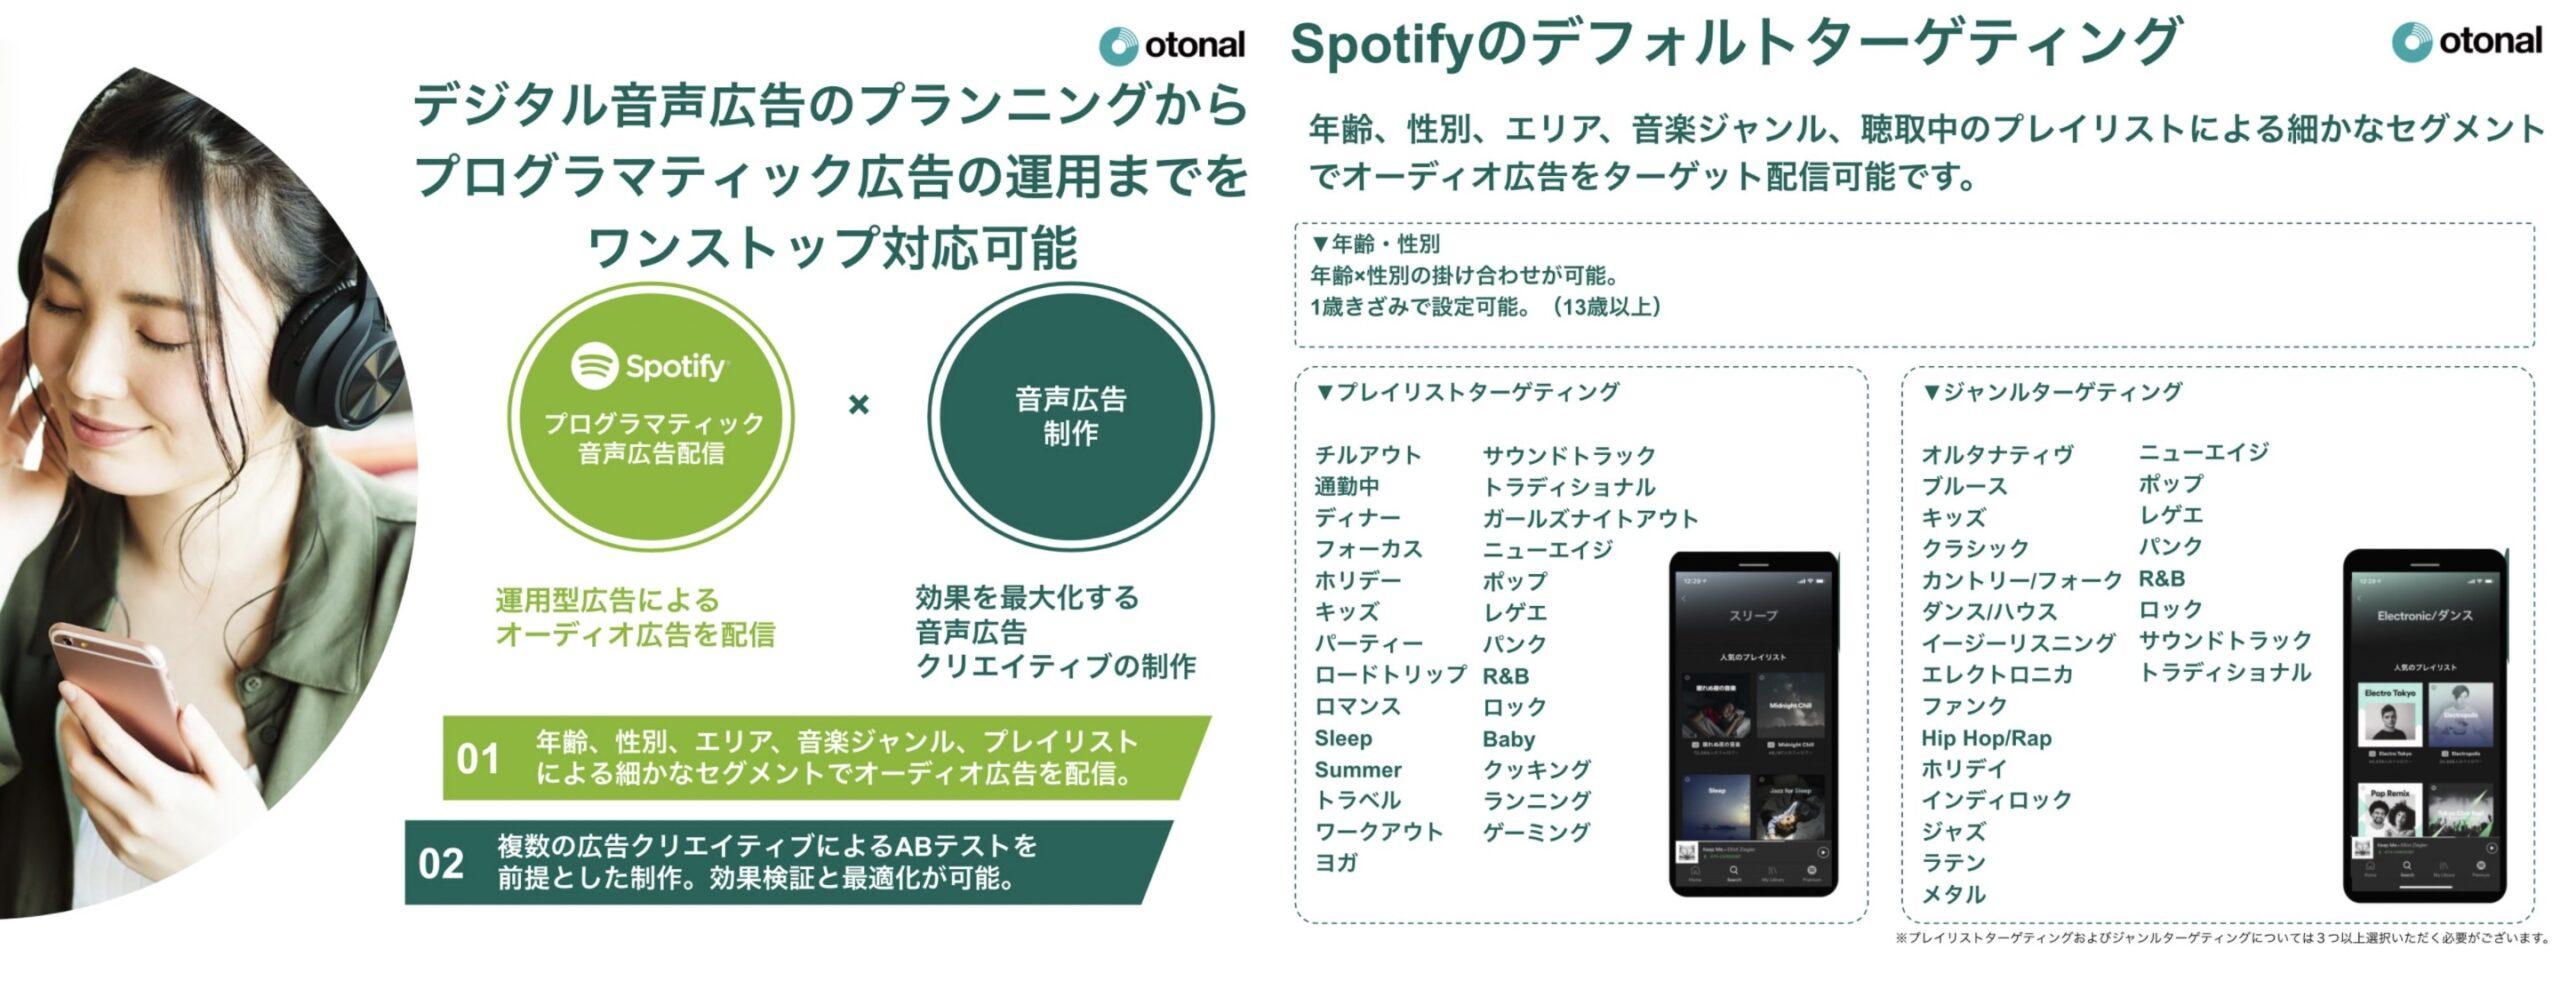 Spotify音声広告配信